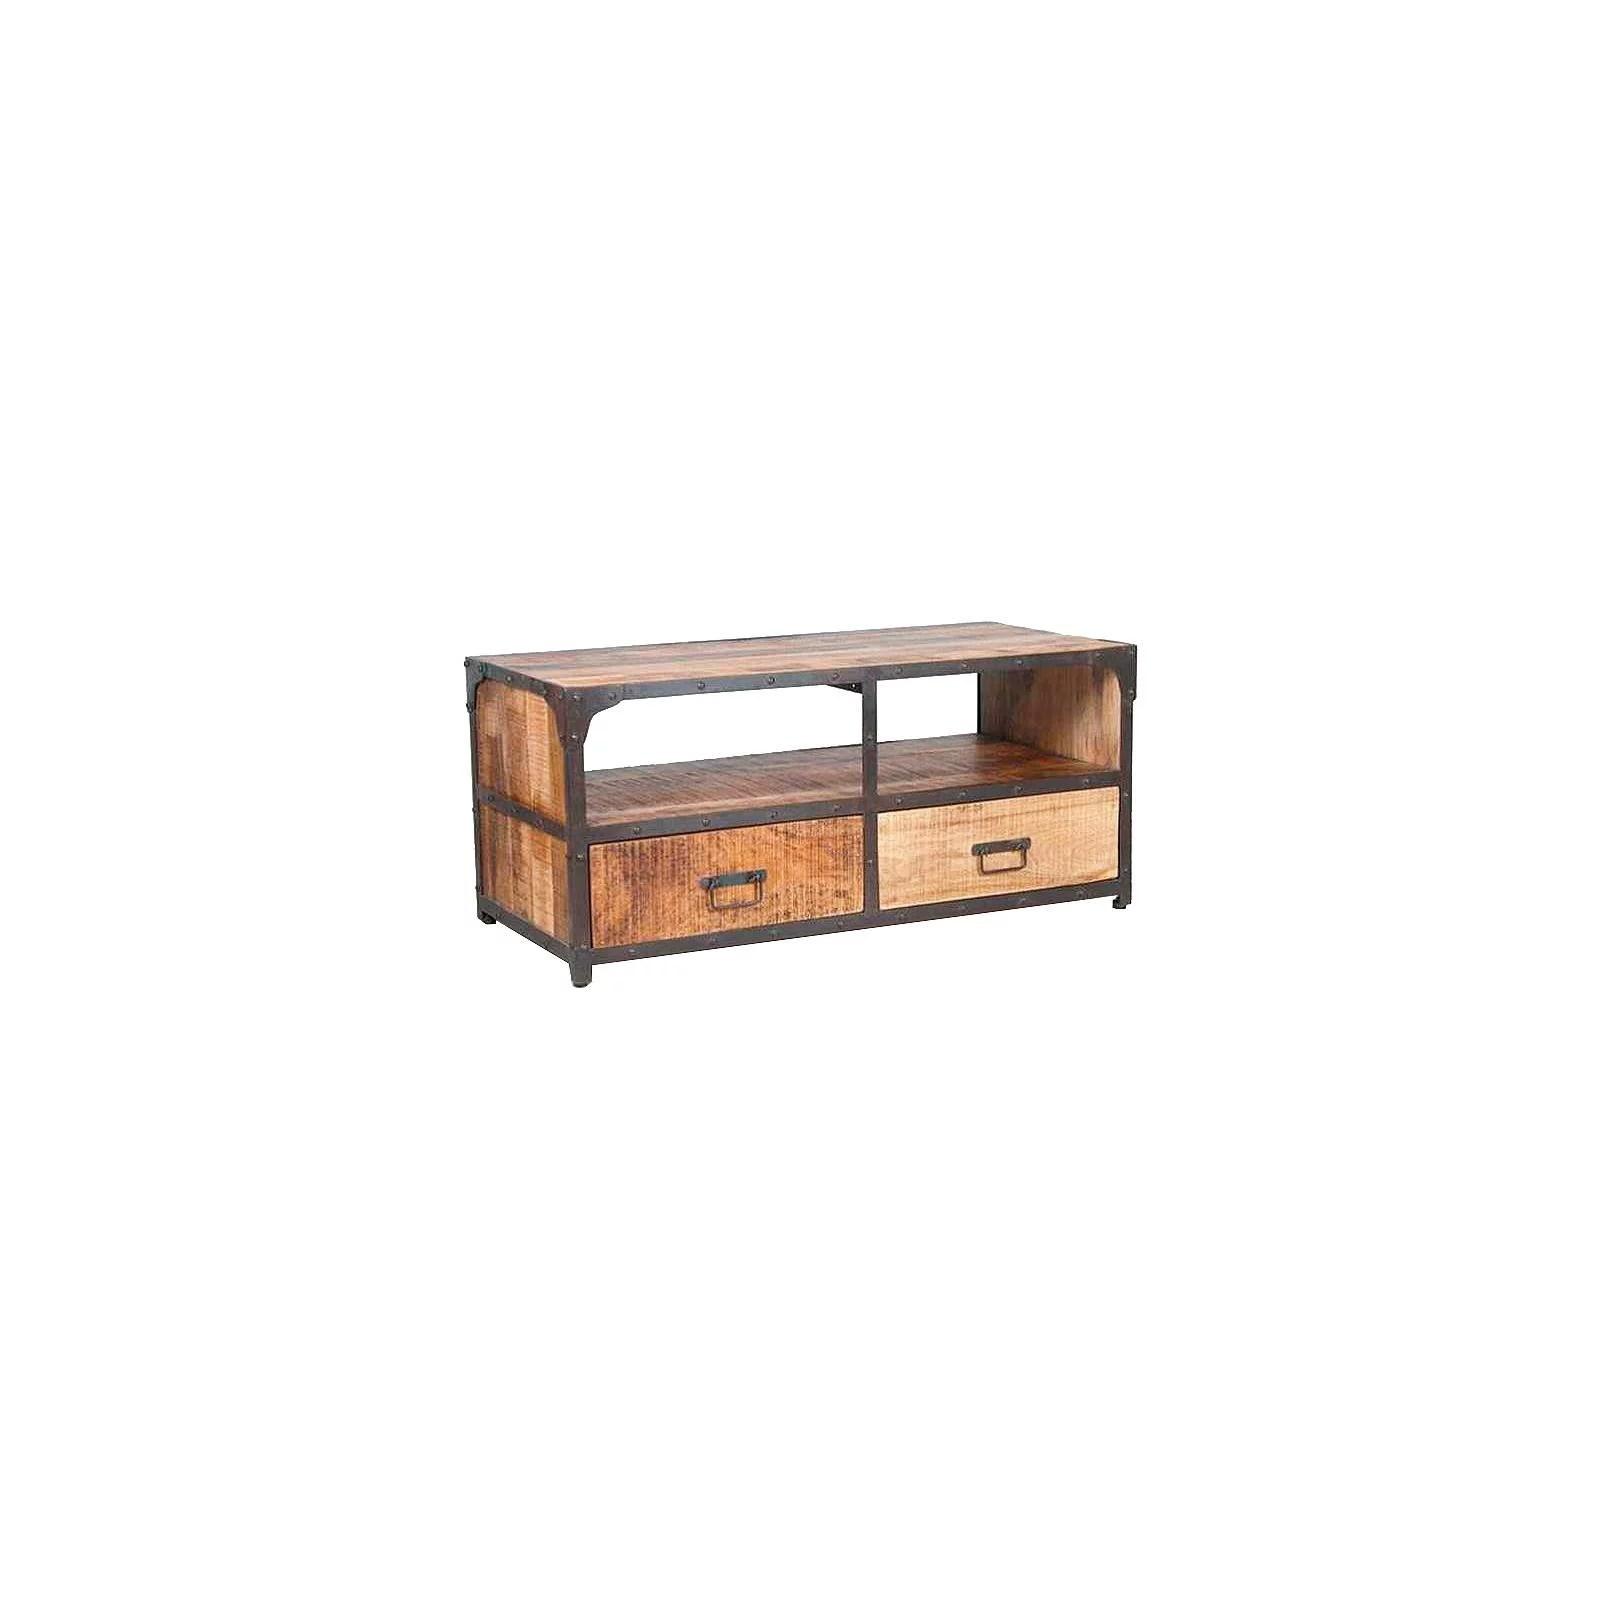 meuble tv industriel pm fabric manguier